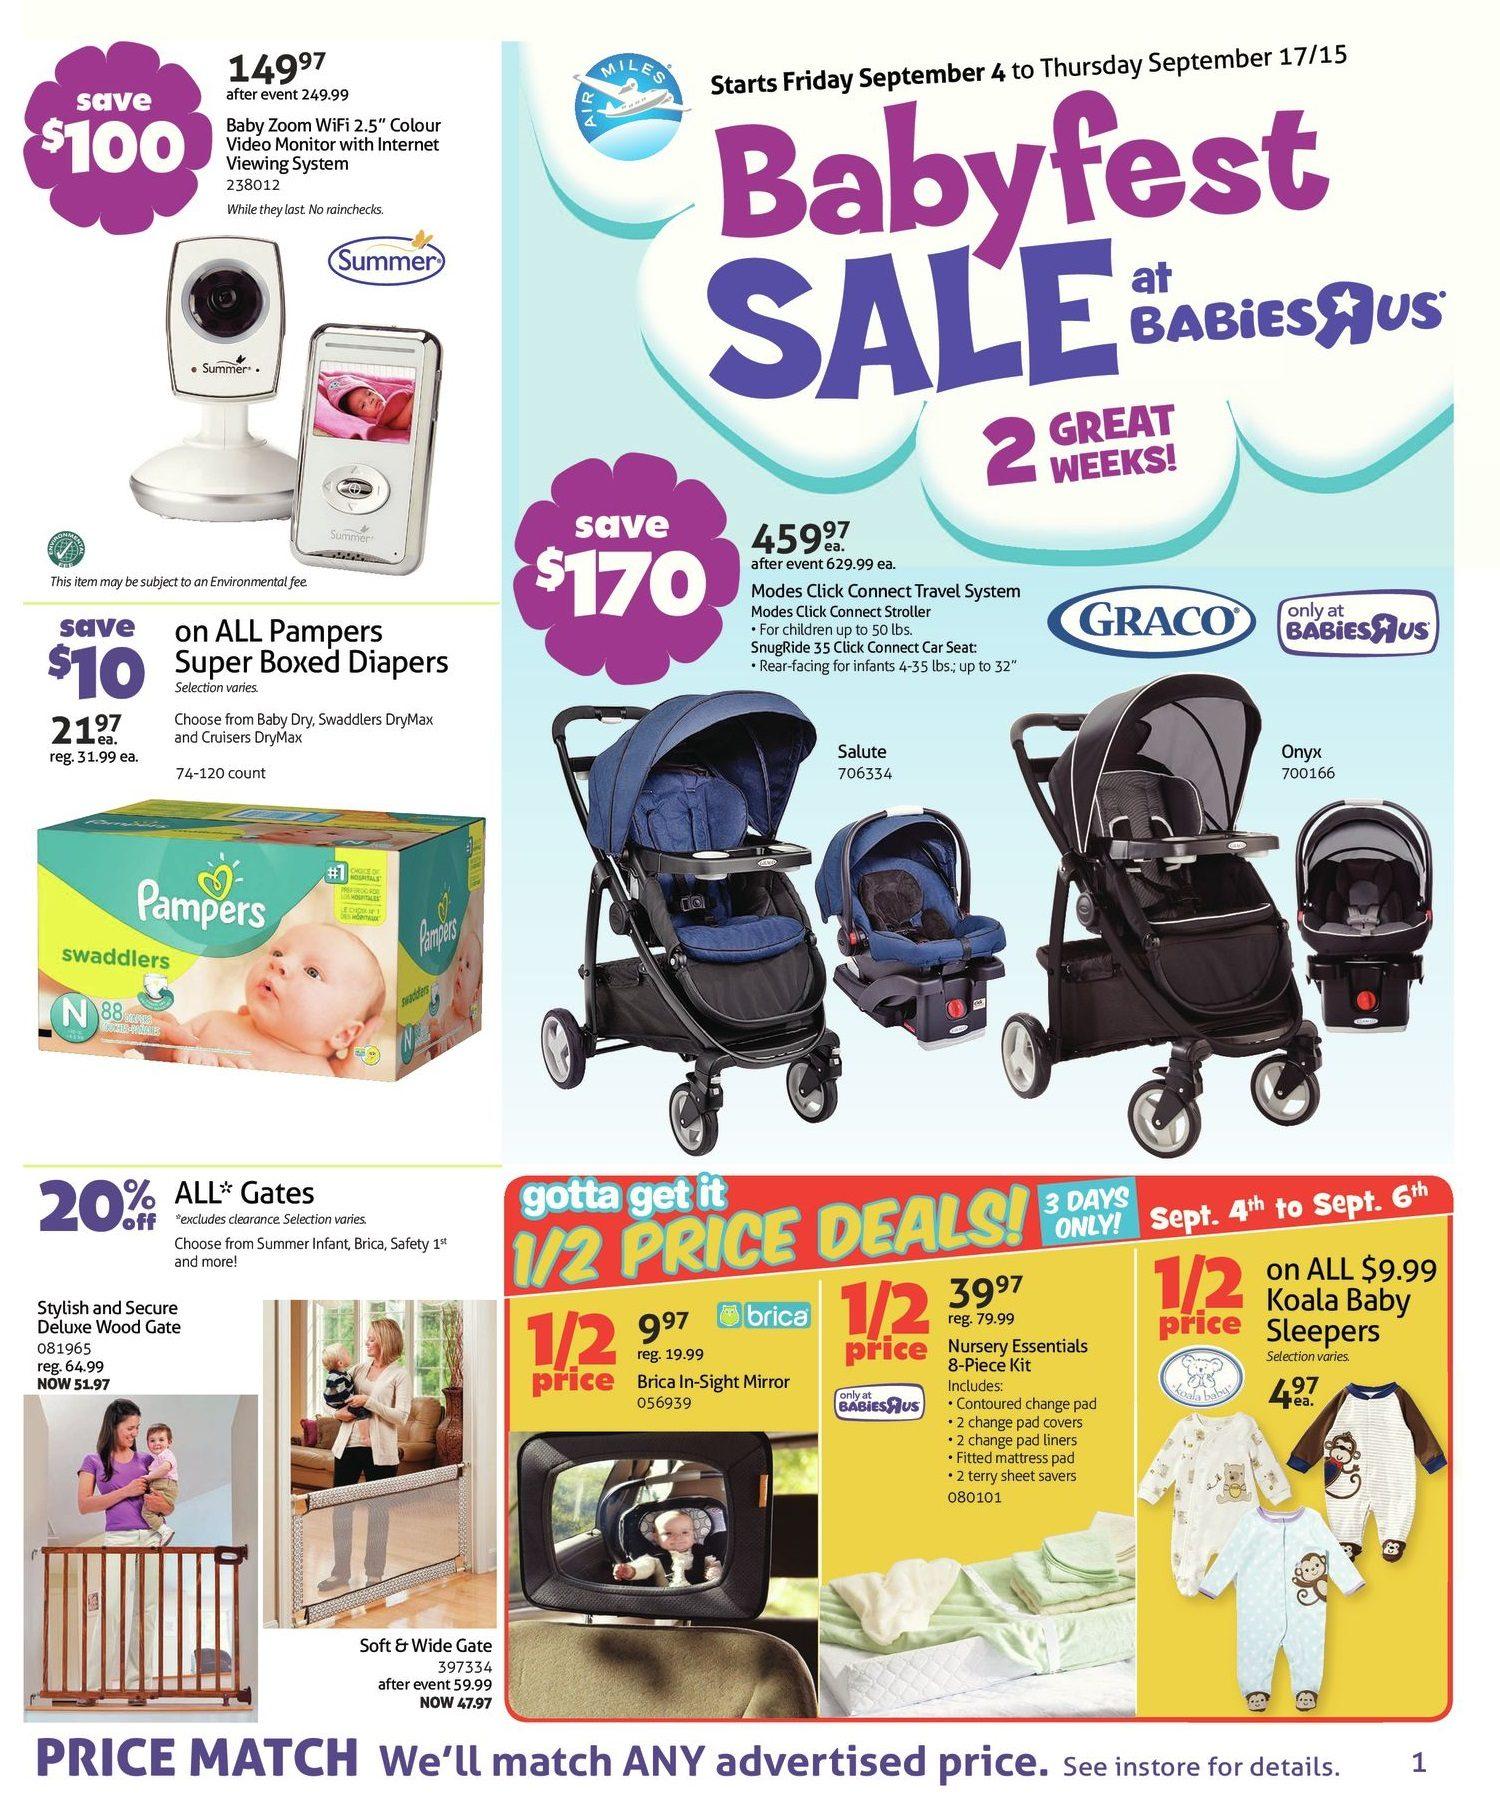 089a7393a Babies R Us Weekly Flyer - 2-Week Sale - Babyfest Sale - Sep 4 – 17 -  RedFlagDeals.com